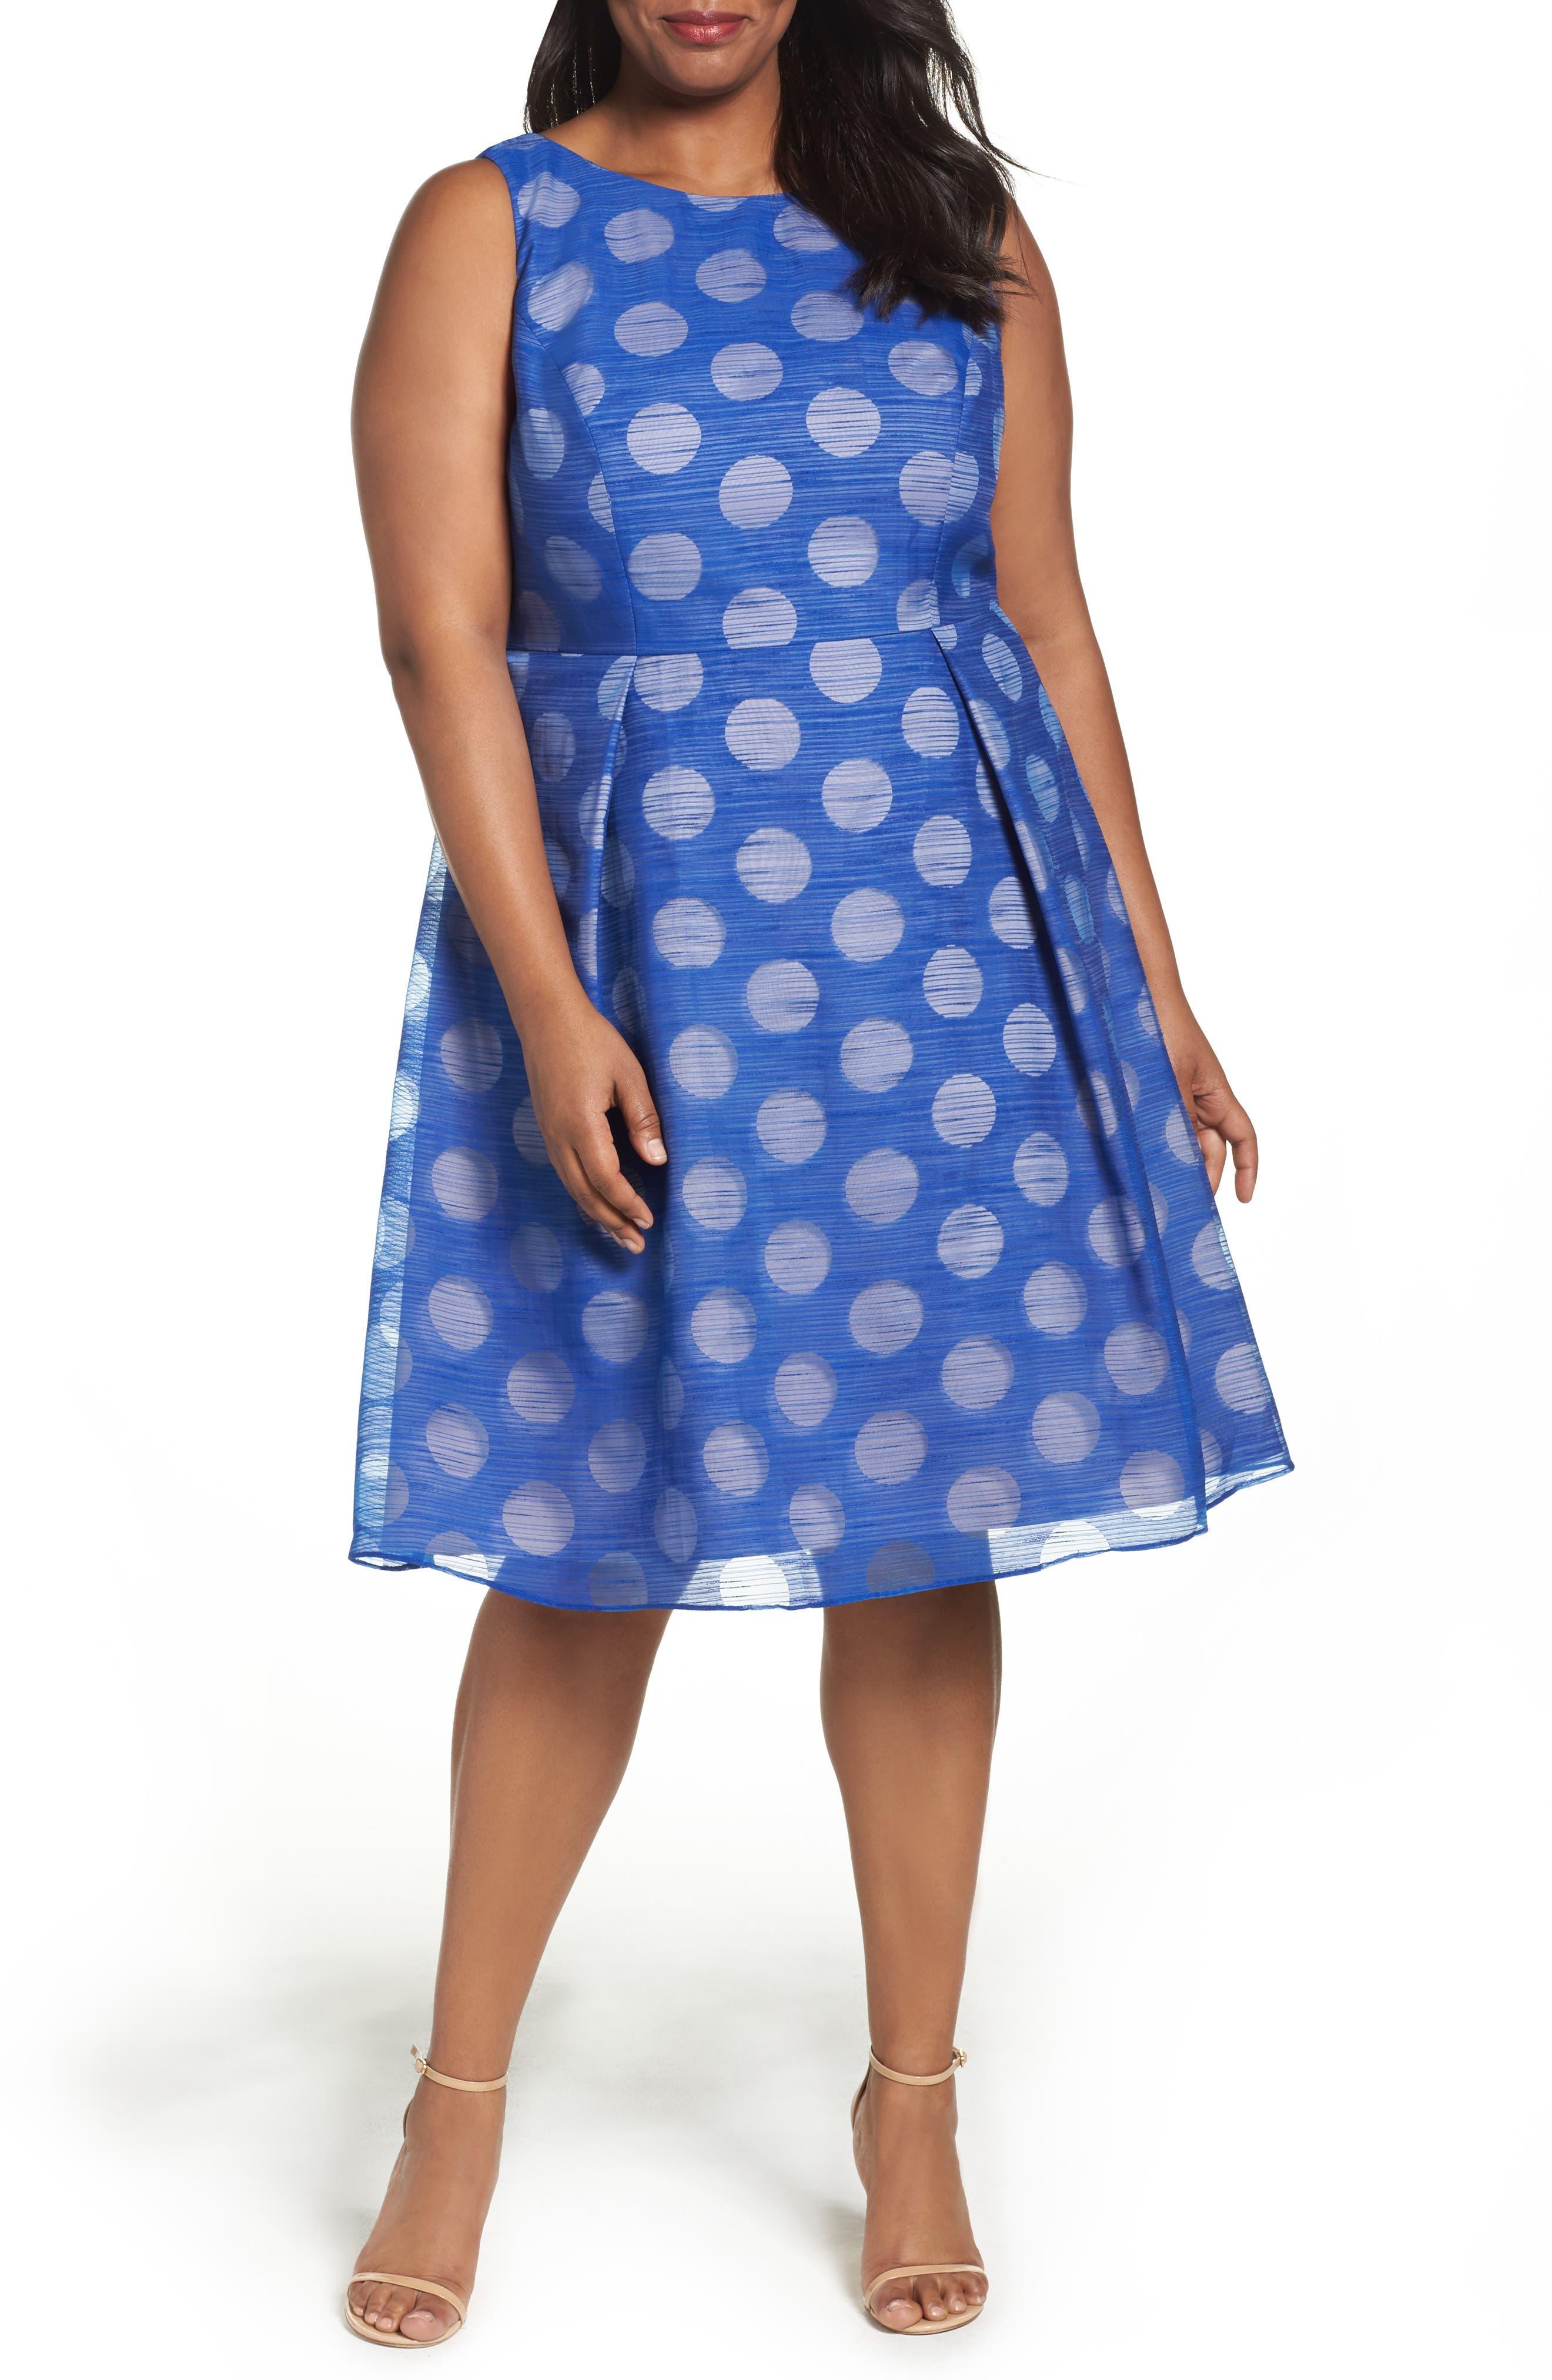 Adrianna Papell Pop Dot Burnout Fit & Flare Dress (Plus Size)